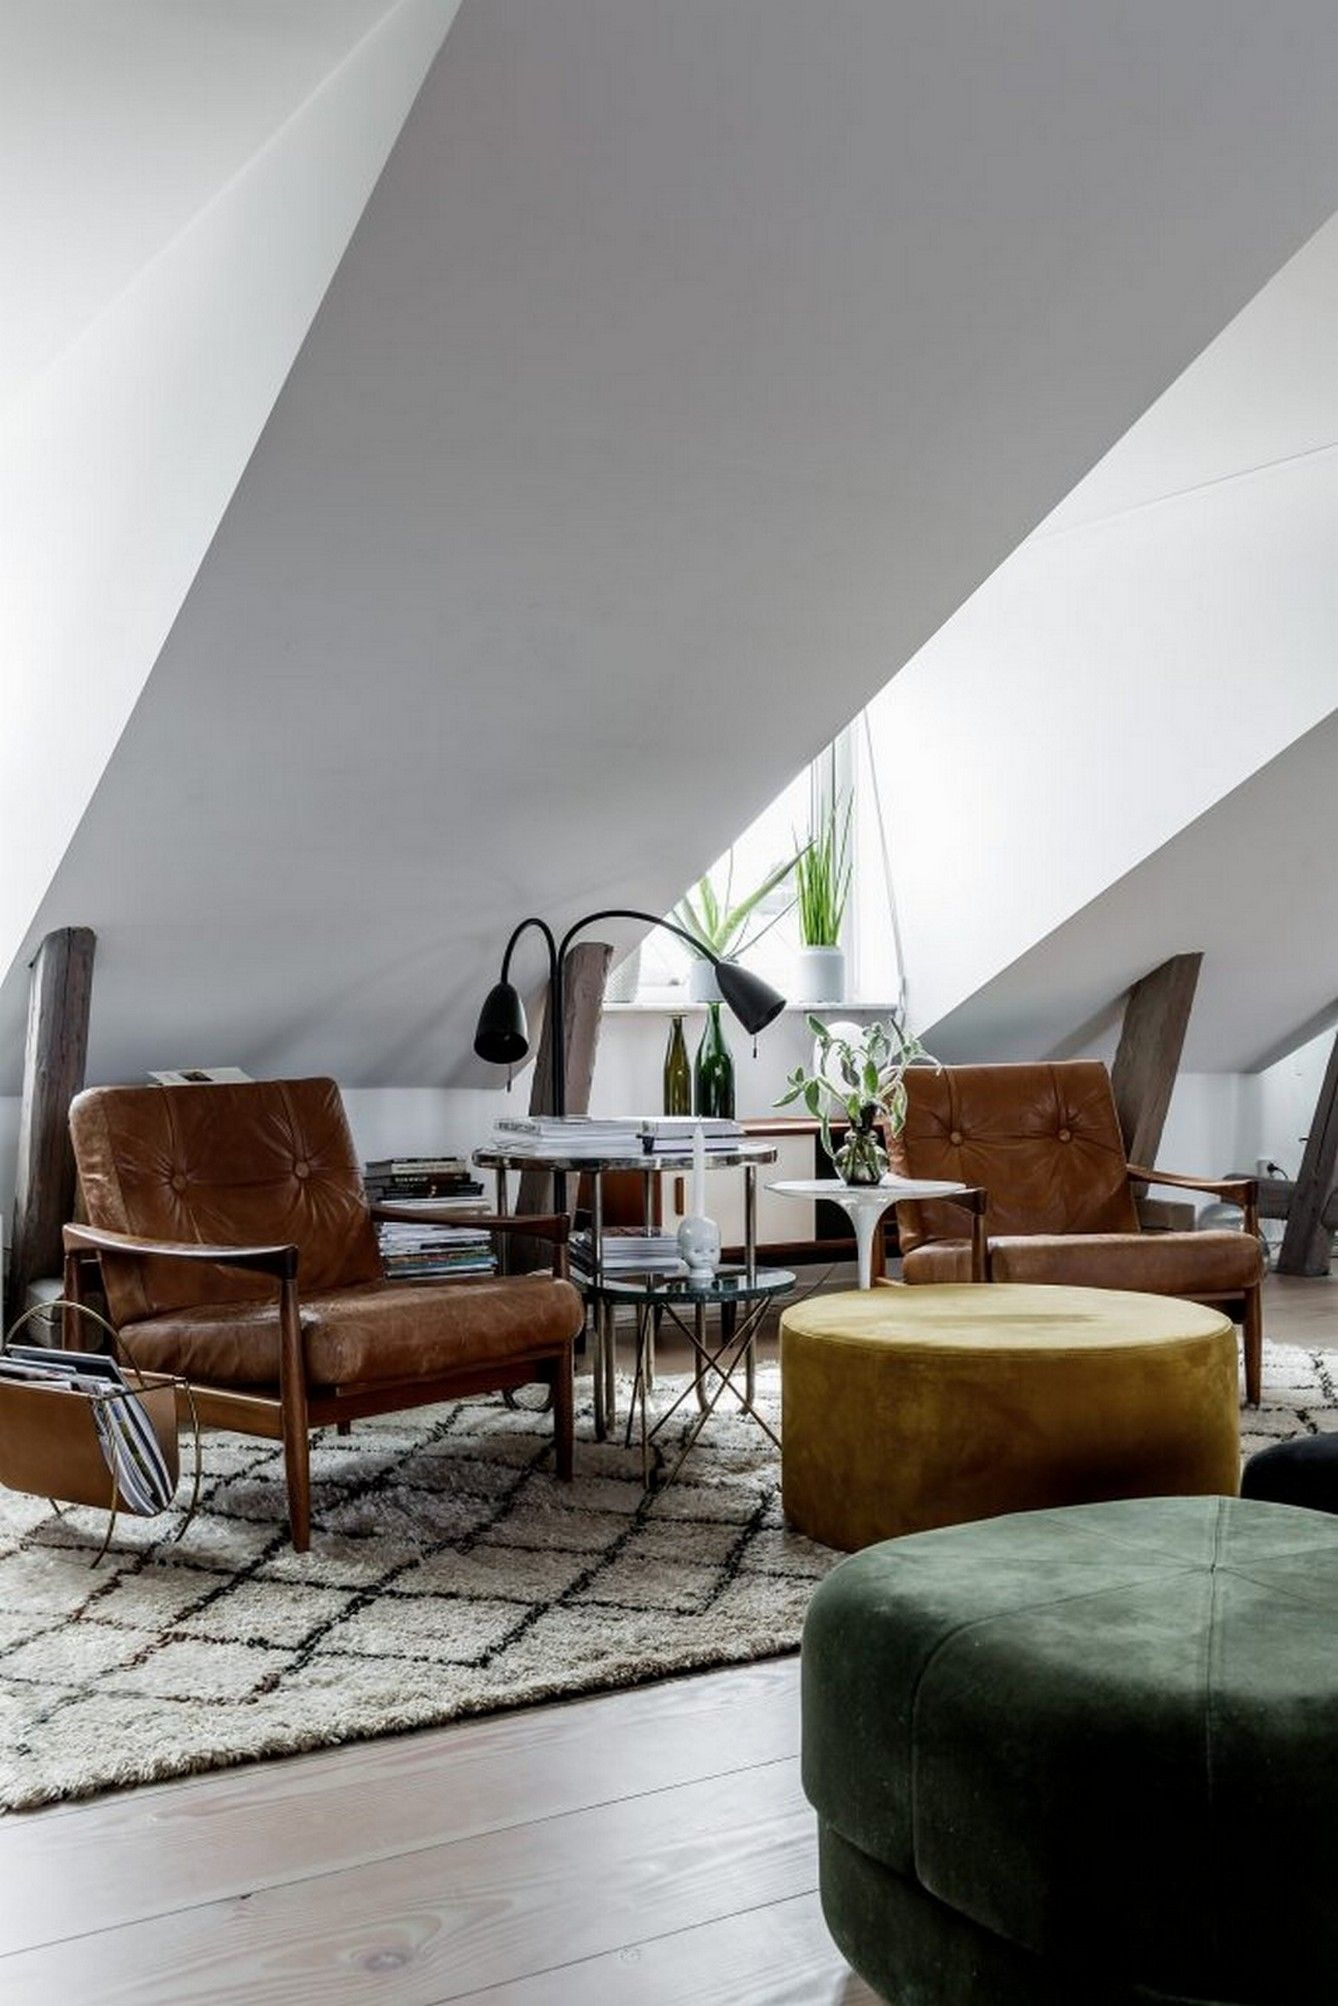 27 Awesome Attic Designs Attic Design Attic Rooms